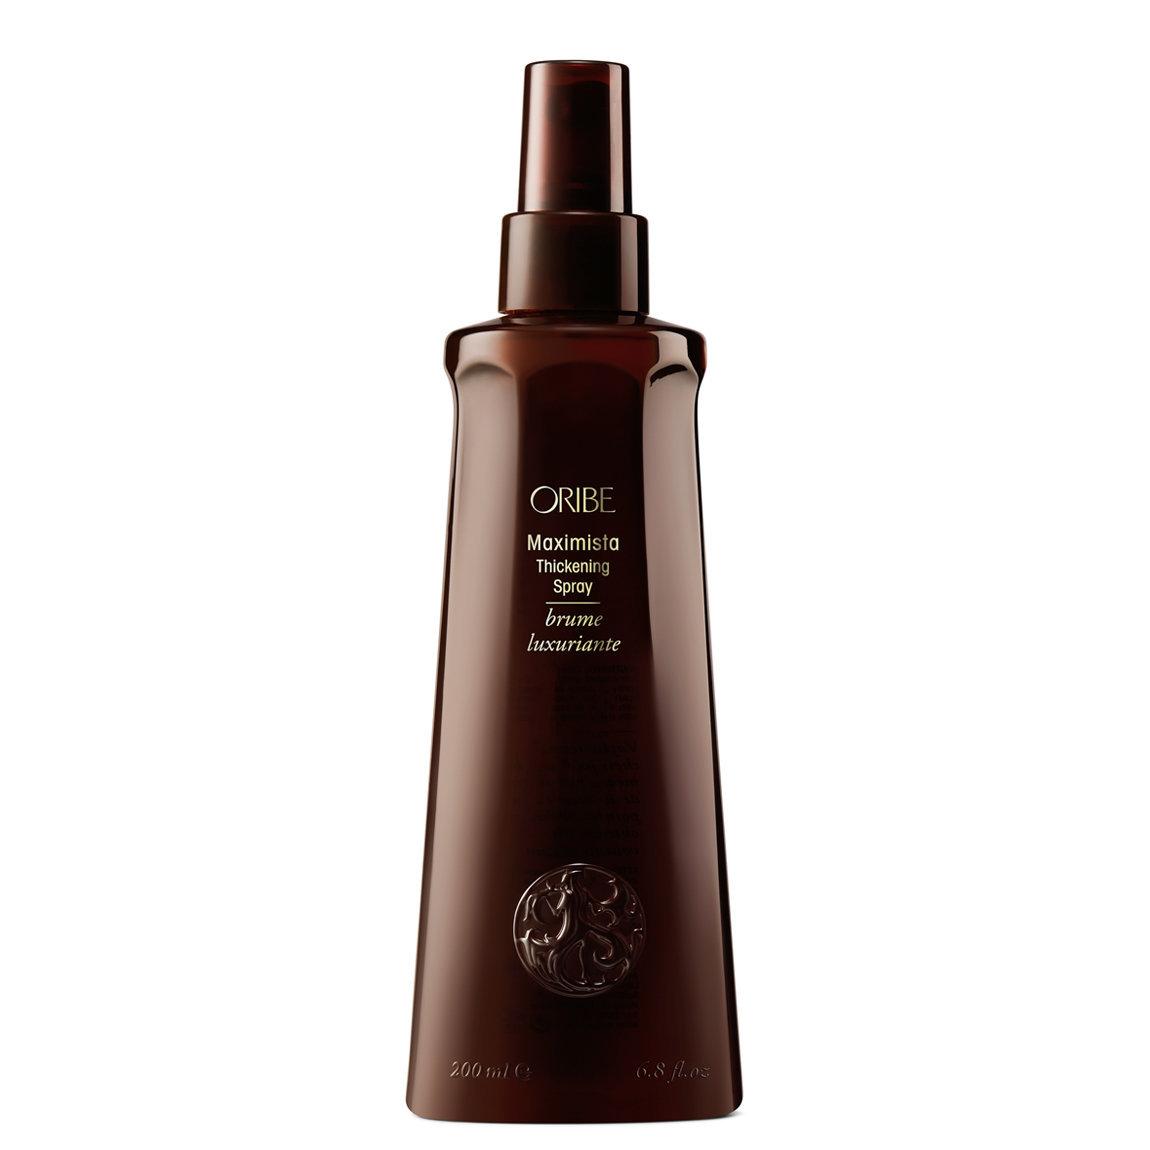 Oribe Maximista Thickening Spray 6.8 oz product swatch.